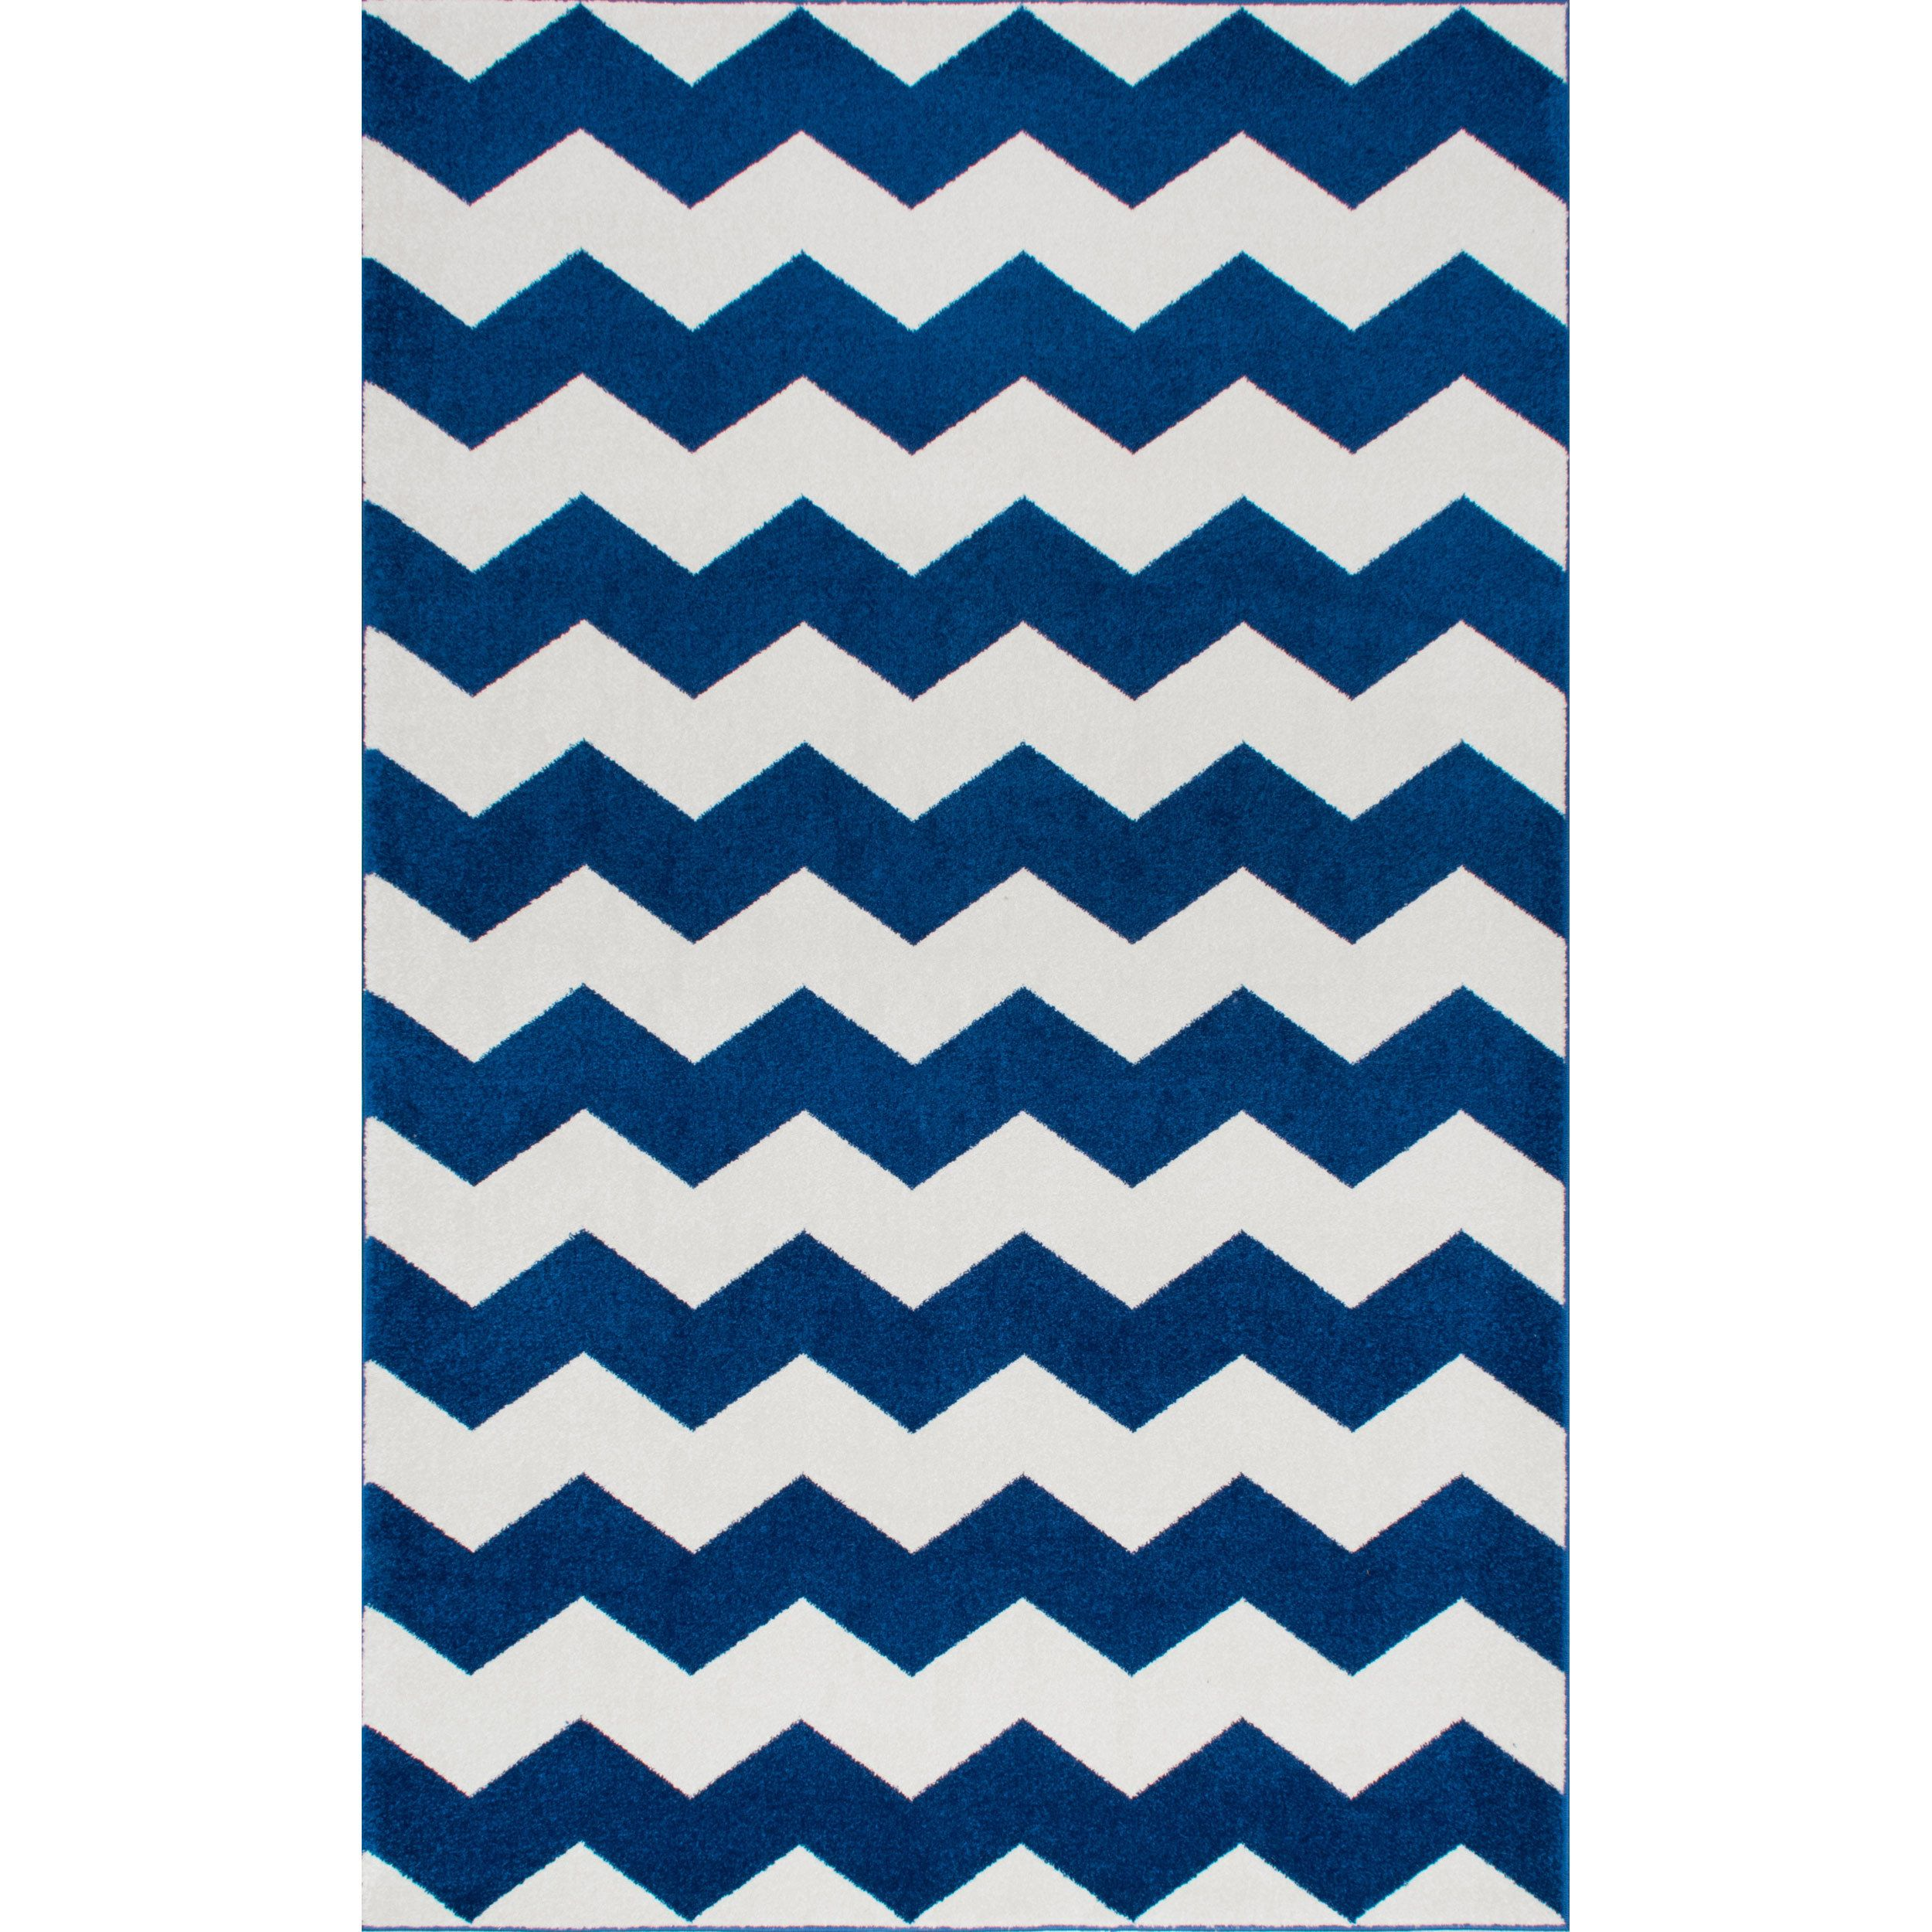 nuloom geometric chevron kids rug (' x ') (grey)  products - nuloom geometric chevron kids rug